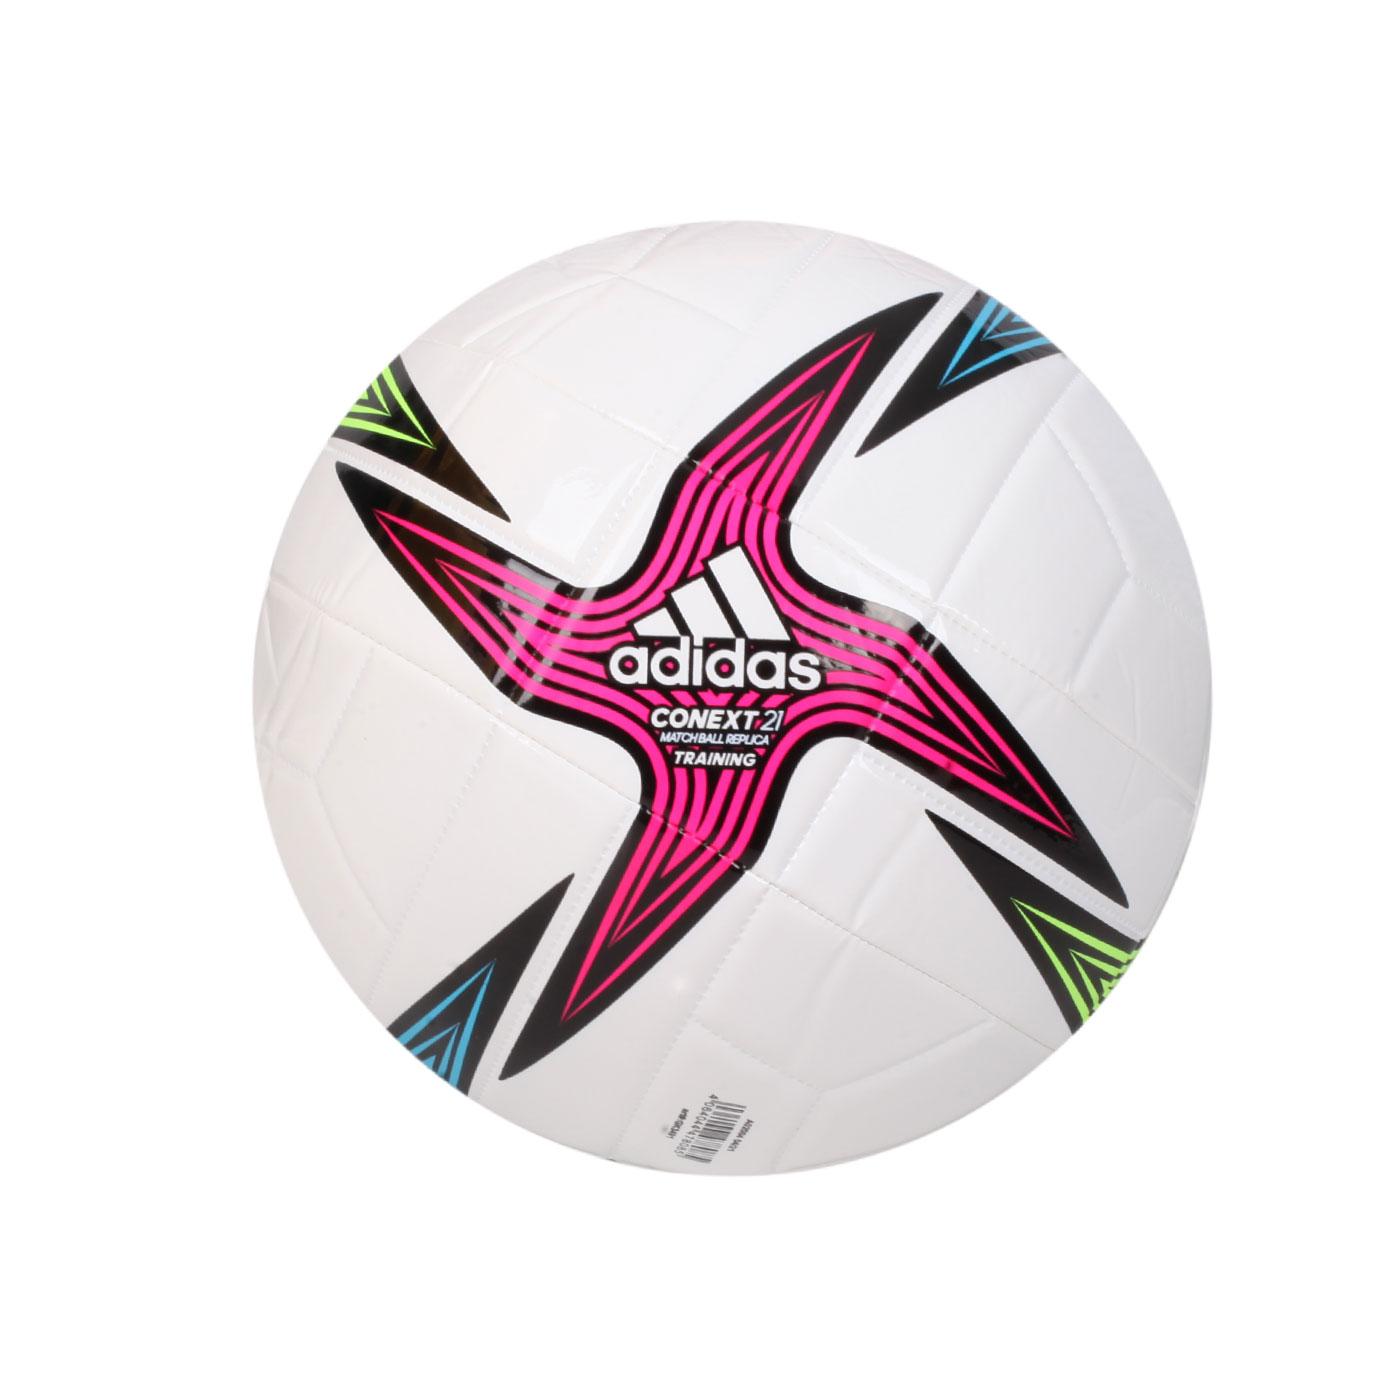 ADIDAS 足球 GK3491 - 白藍綠桃紅